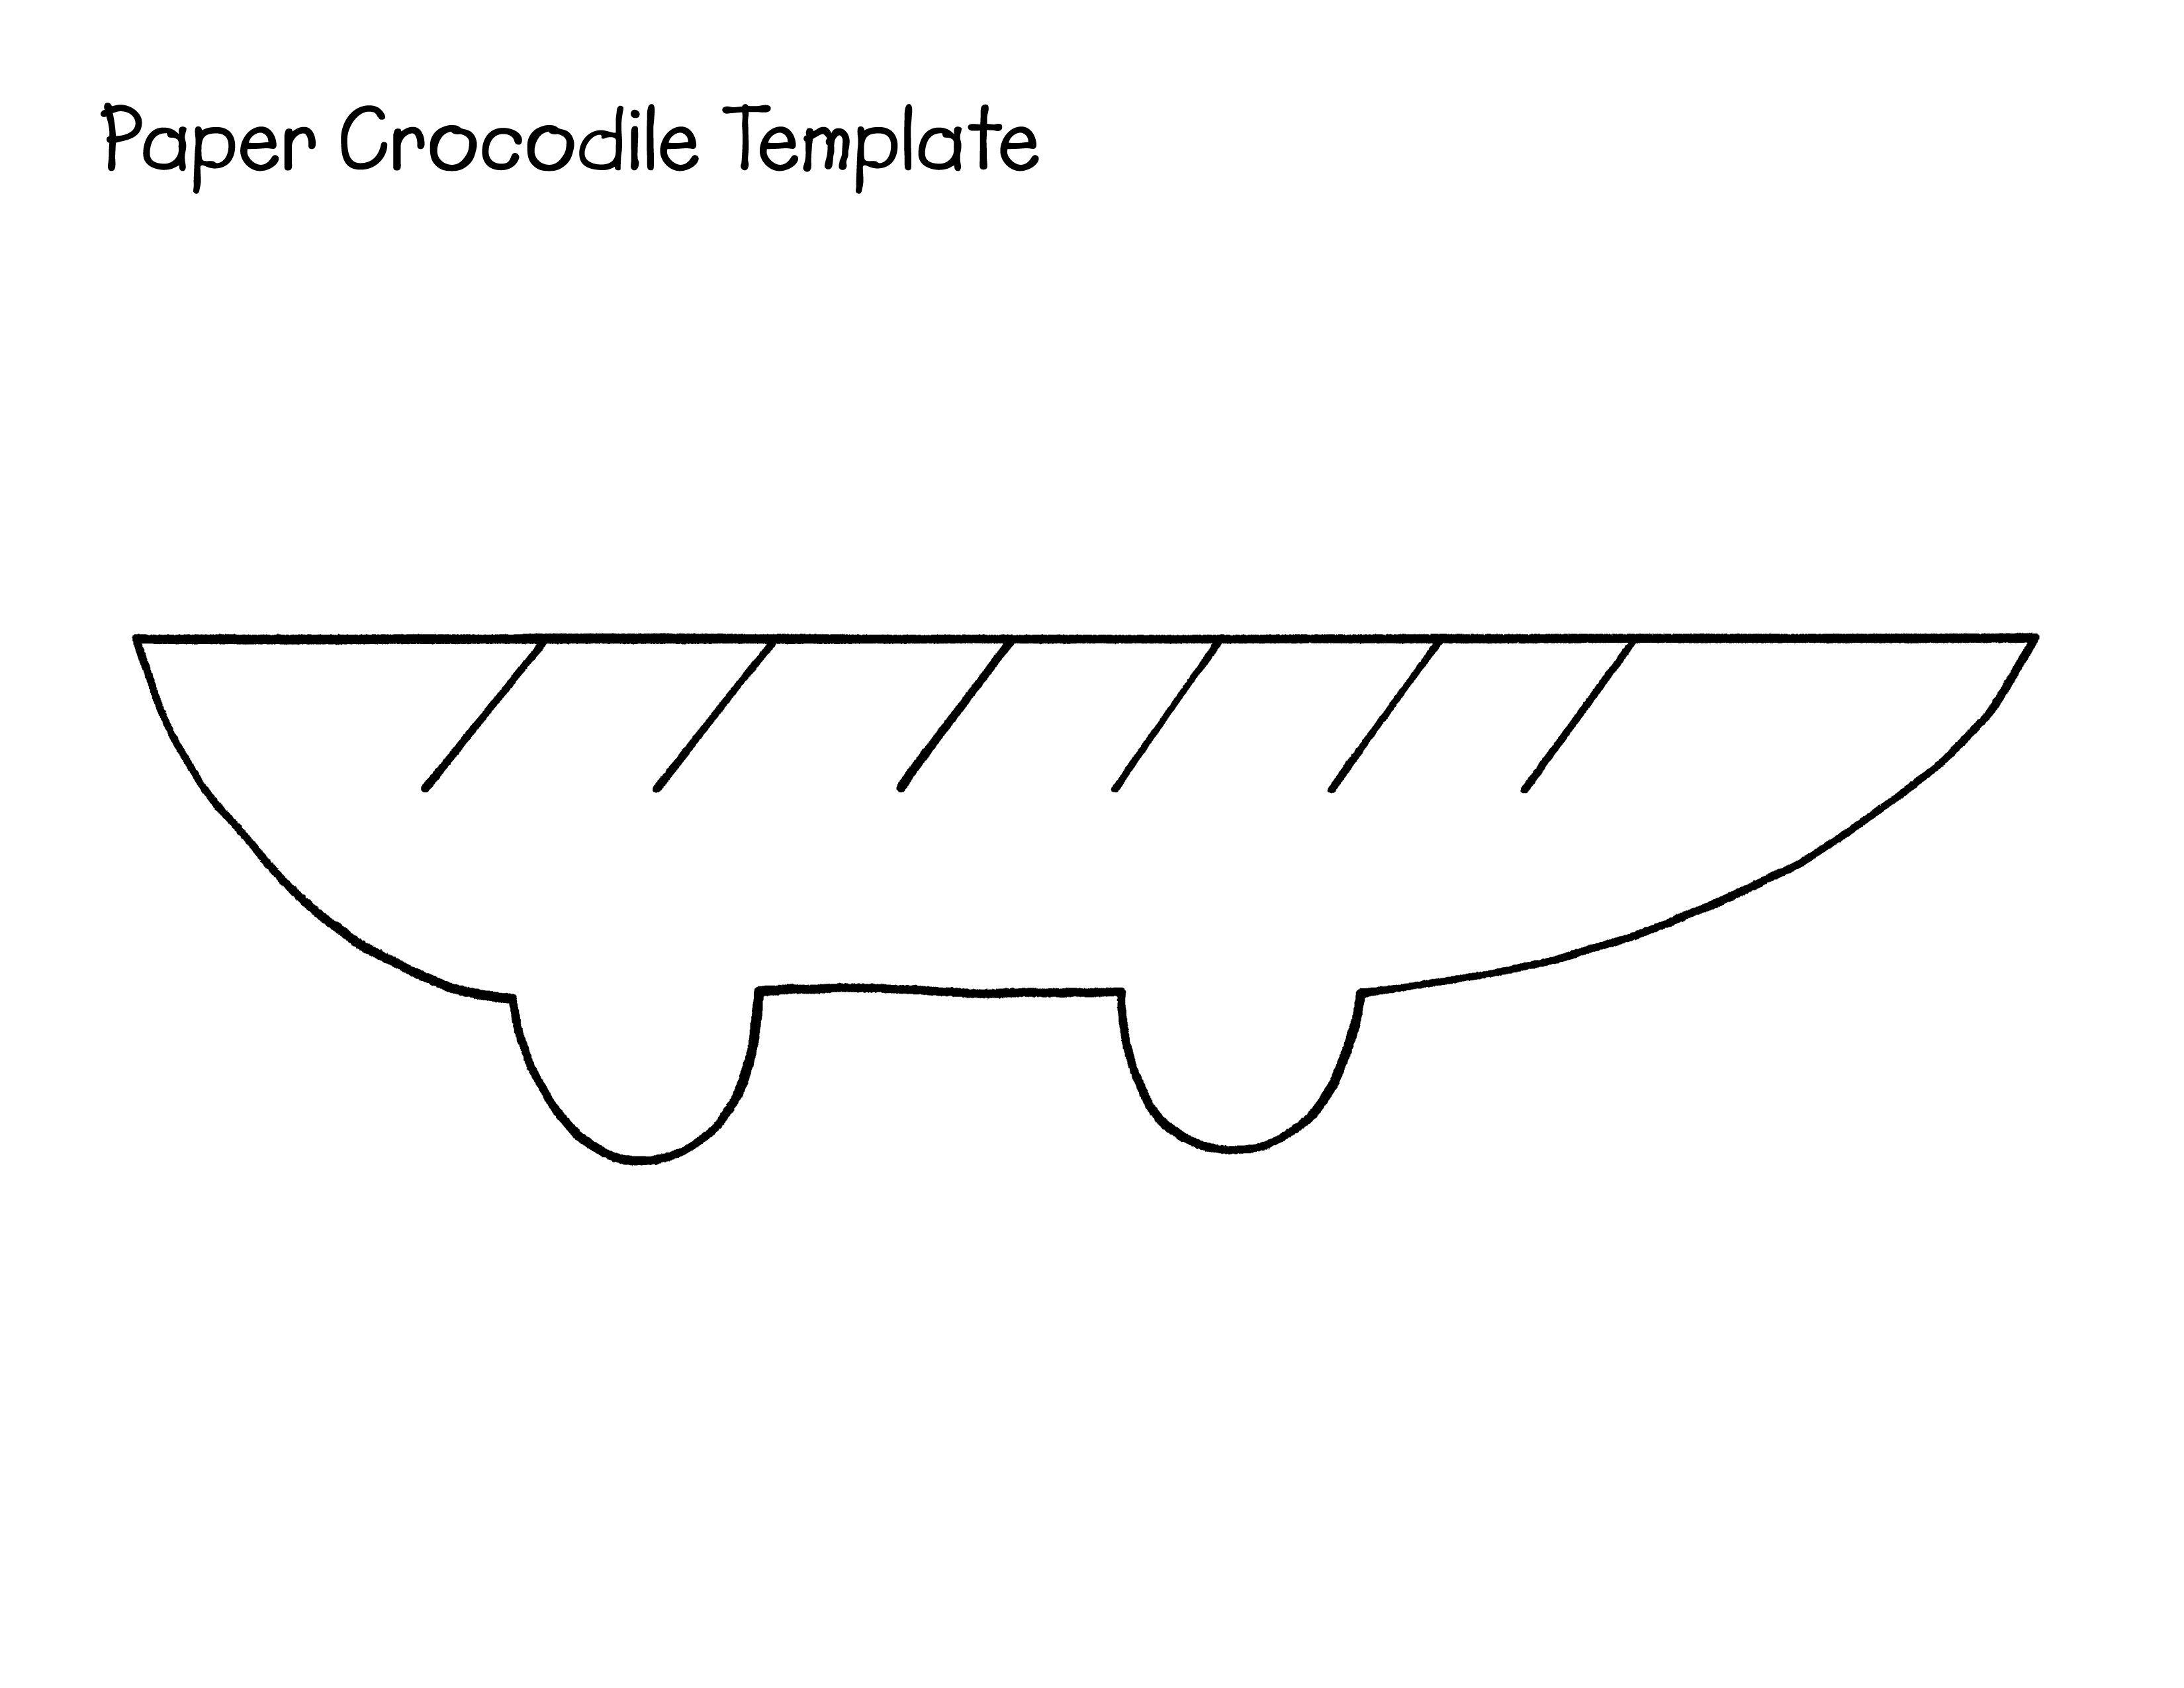 crocodile craft summer pinterest crocodile craft crocodile